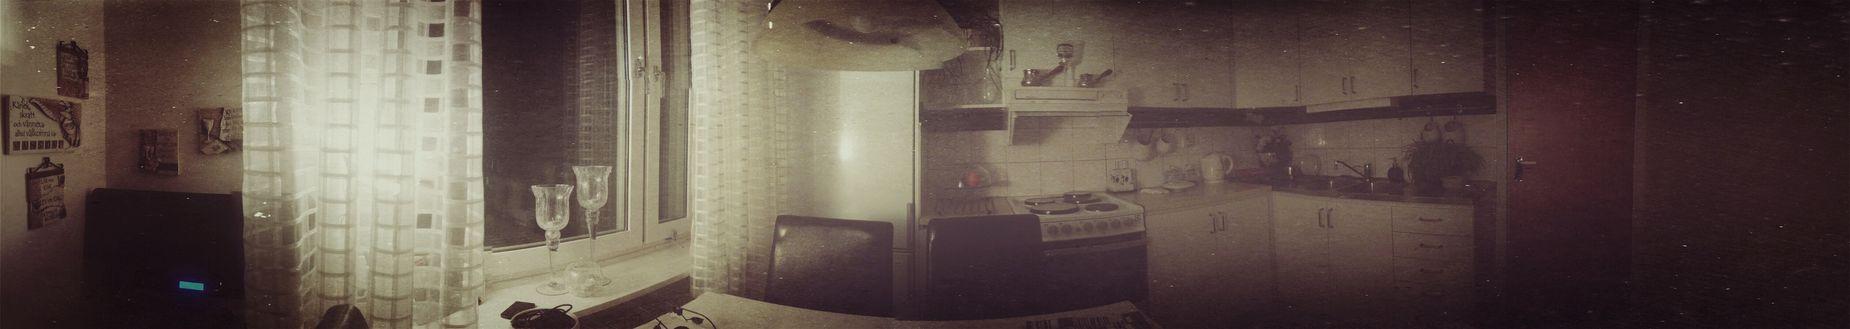 Kitchen 360 Retro Widescreen Having Tea